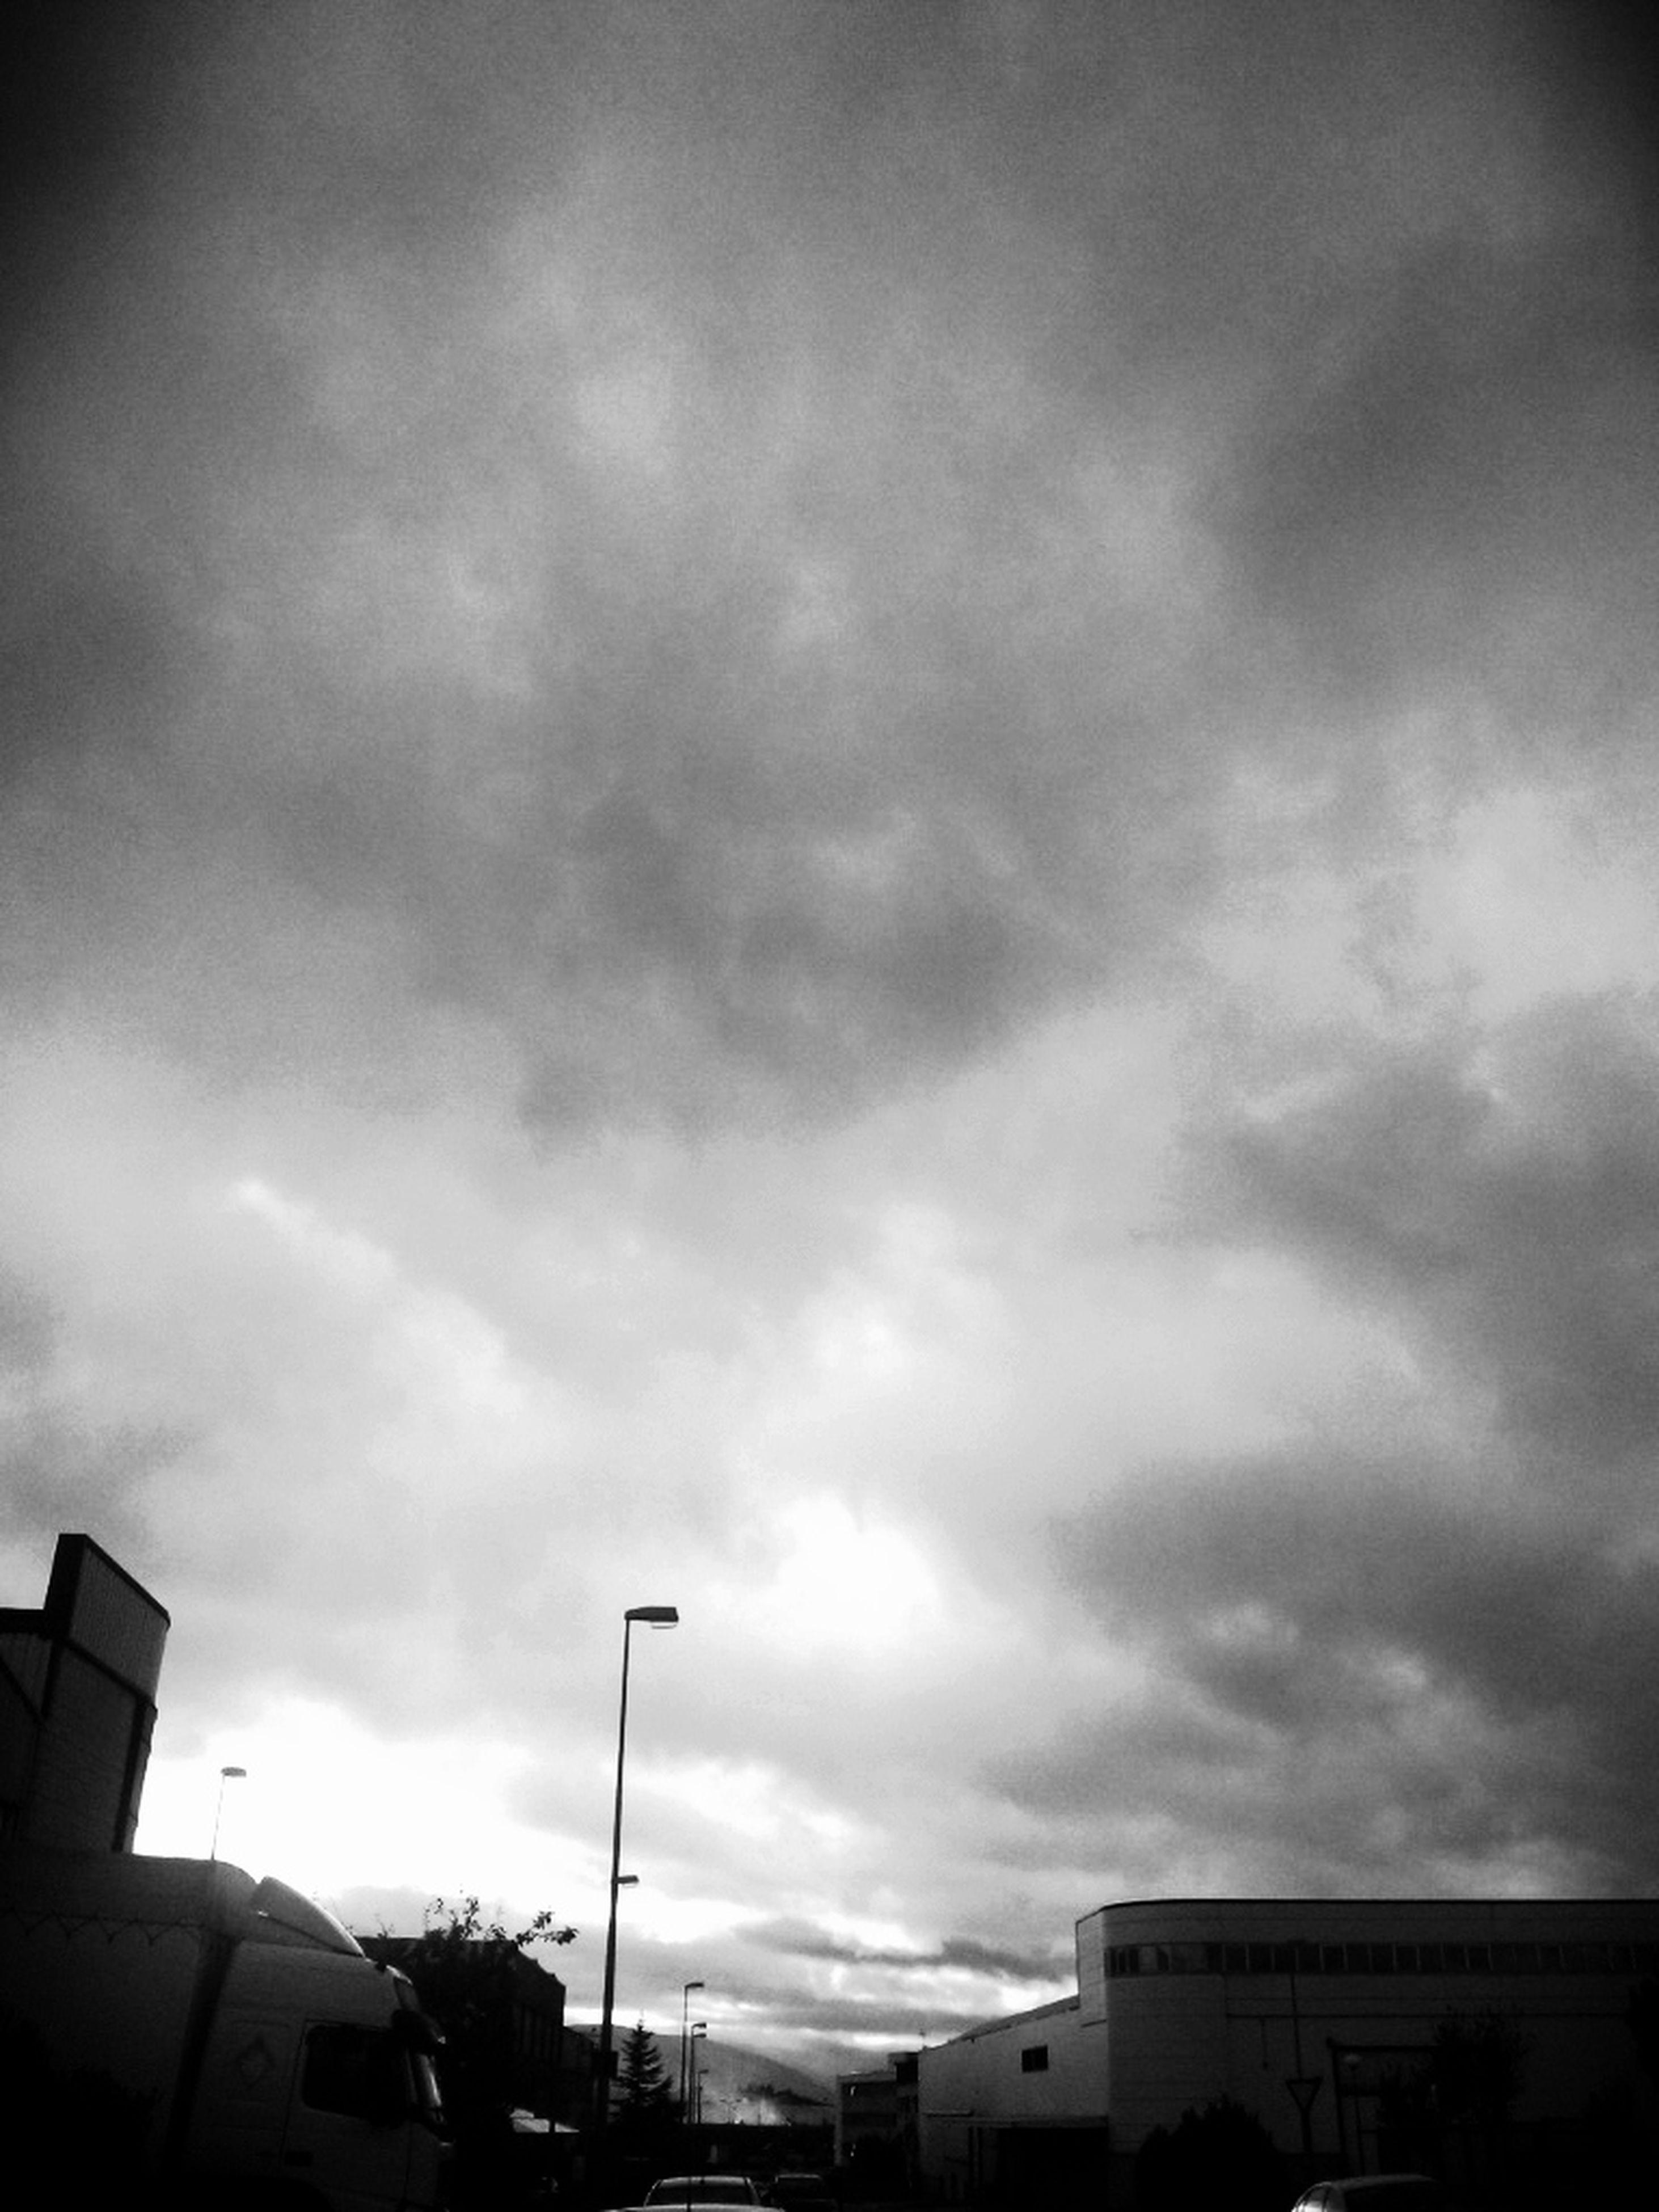 building exterior, sky, architecture, built structure, low angle view, cloud - sky, cloudy, city, building, cloud, overcast, weather, street light, residential building, silhouette, residential structure, high section, dusk, outdoors, storm cloud